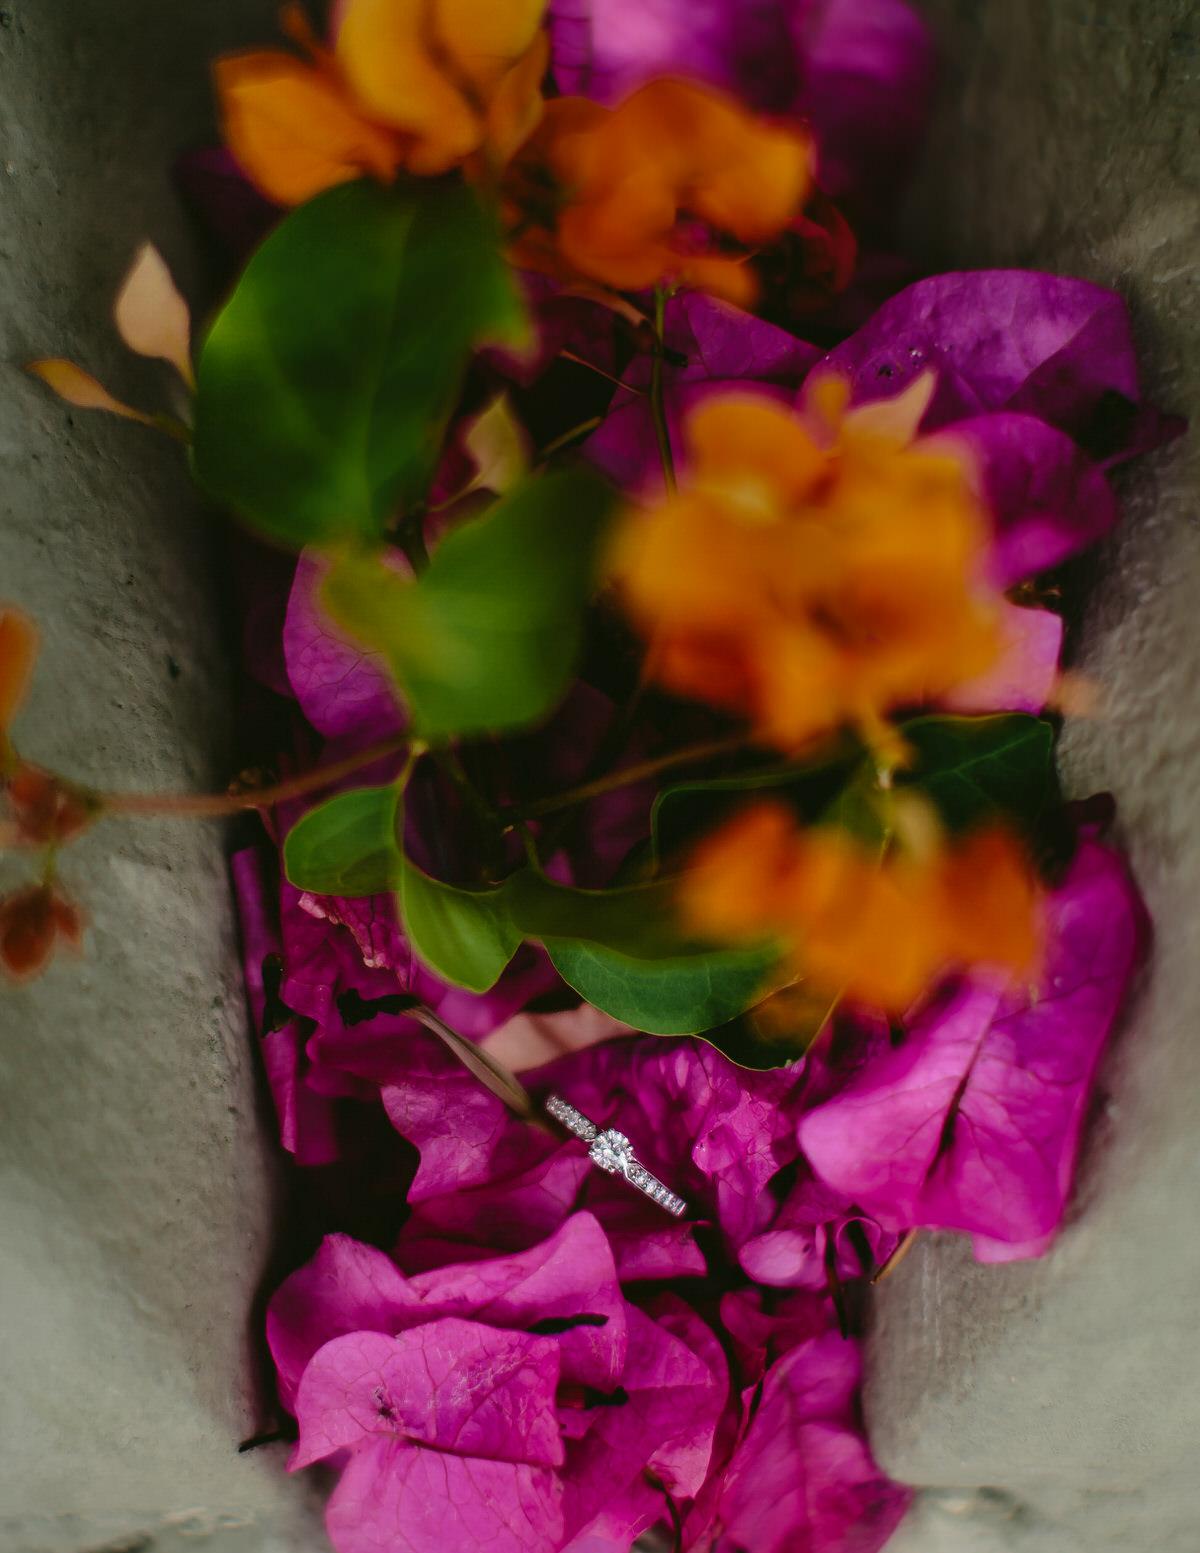 engagement-rings-colorful-flowers-tiny-house-photo-destination-wedding-photographer.jpg